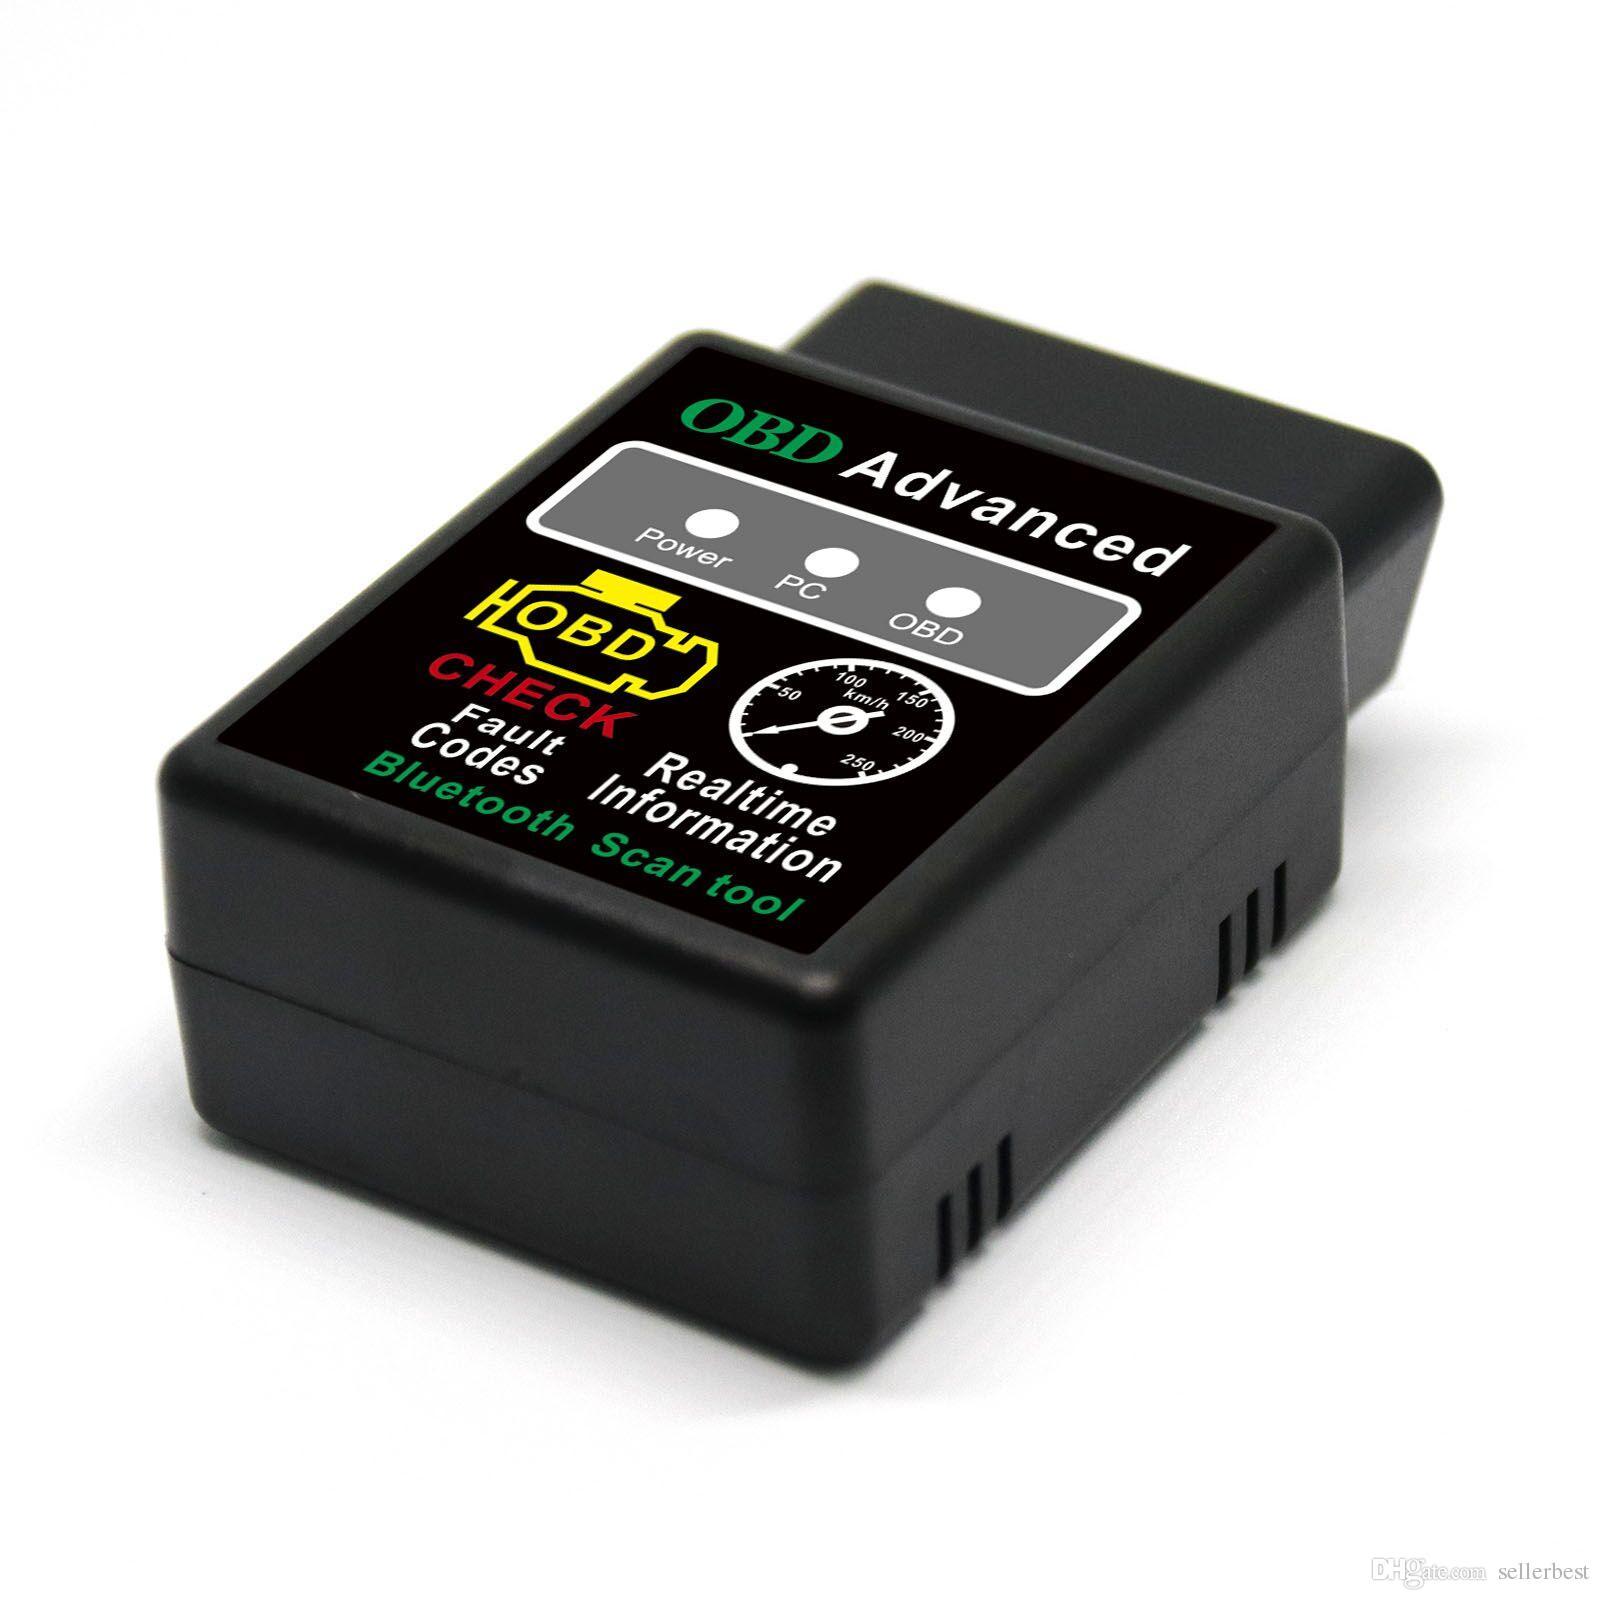 Vgate-Scan-Werkzeug Qualität A + V1.5 Version 1.5 Super-OBD-Scan-Mini-elm327 Bluetooth-Ulme 327 OBDII OBD2-Auto-Diagnose-intercace